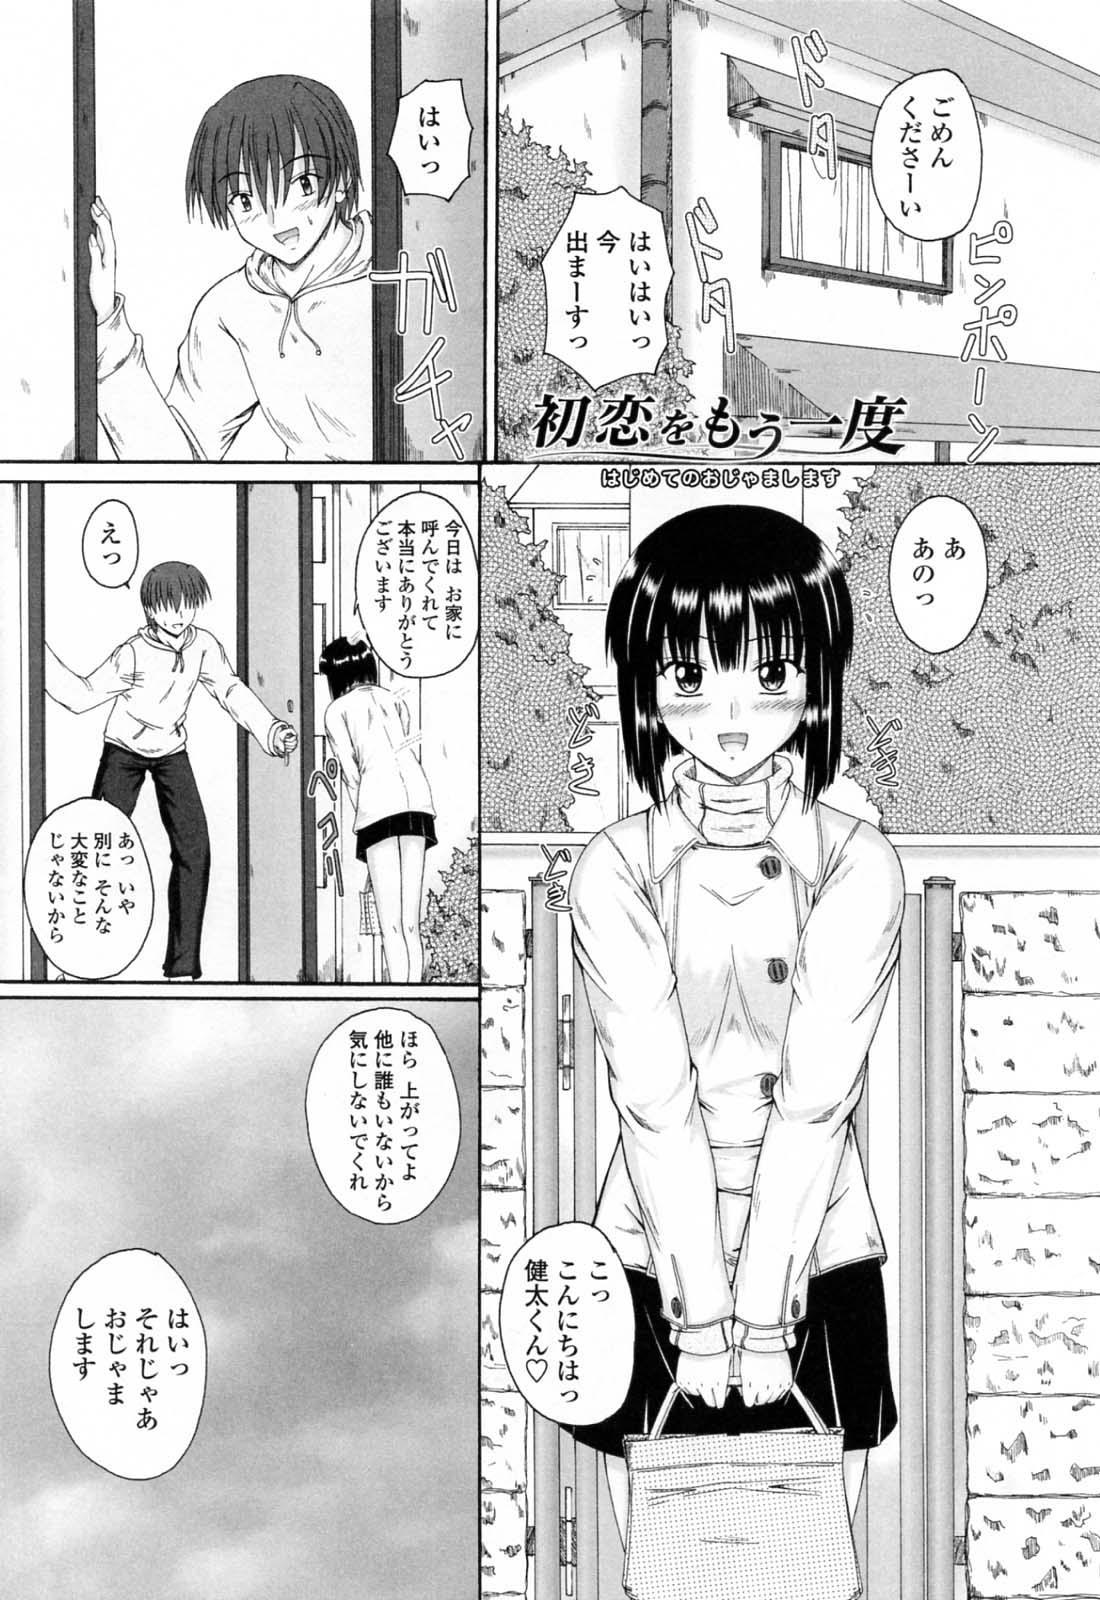 Chaku Love - Dress and Love? 58